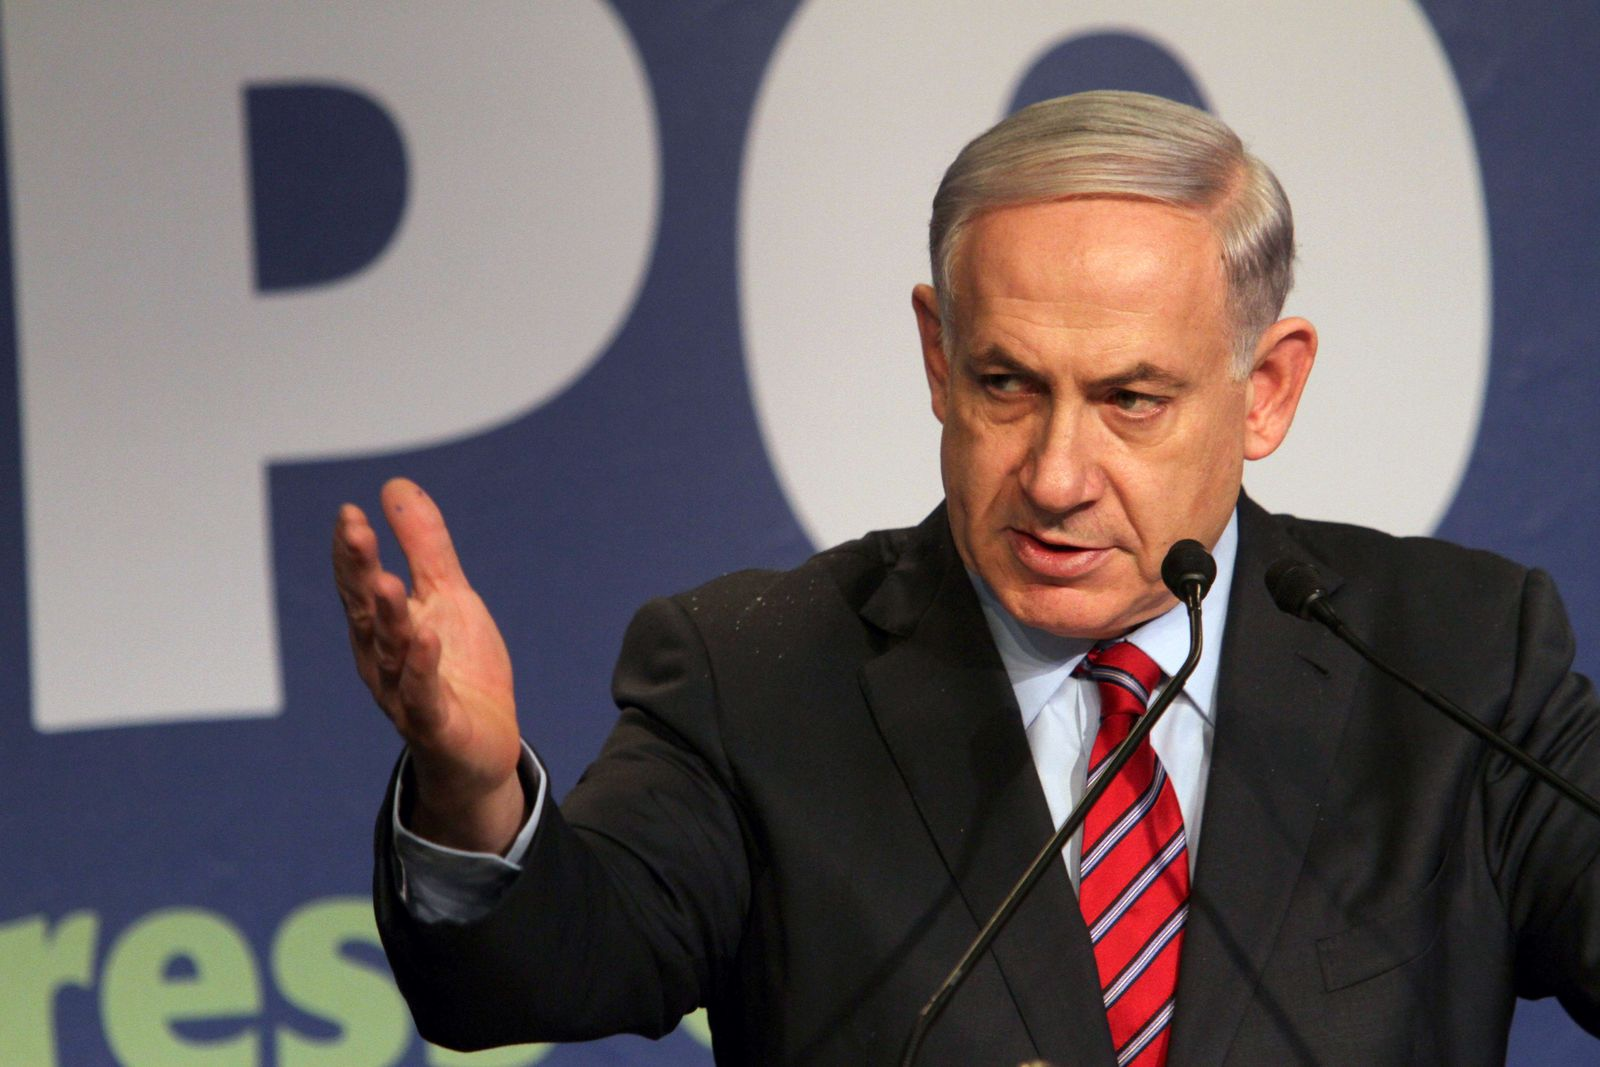 ISRAEL-POLITICS-NETANYAHU Netanjahu